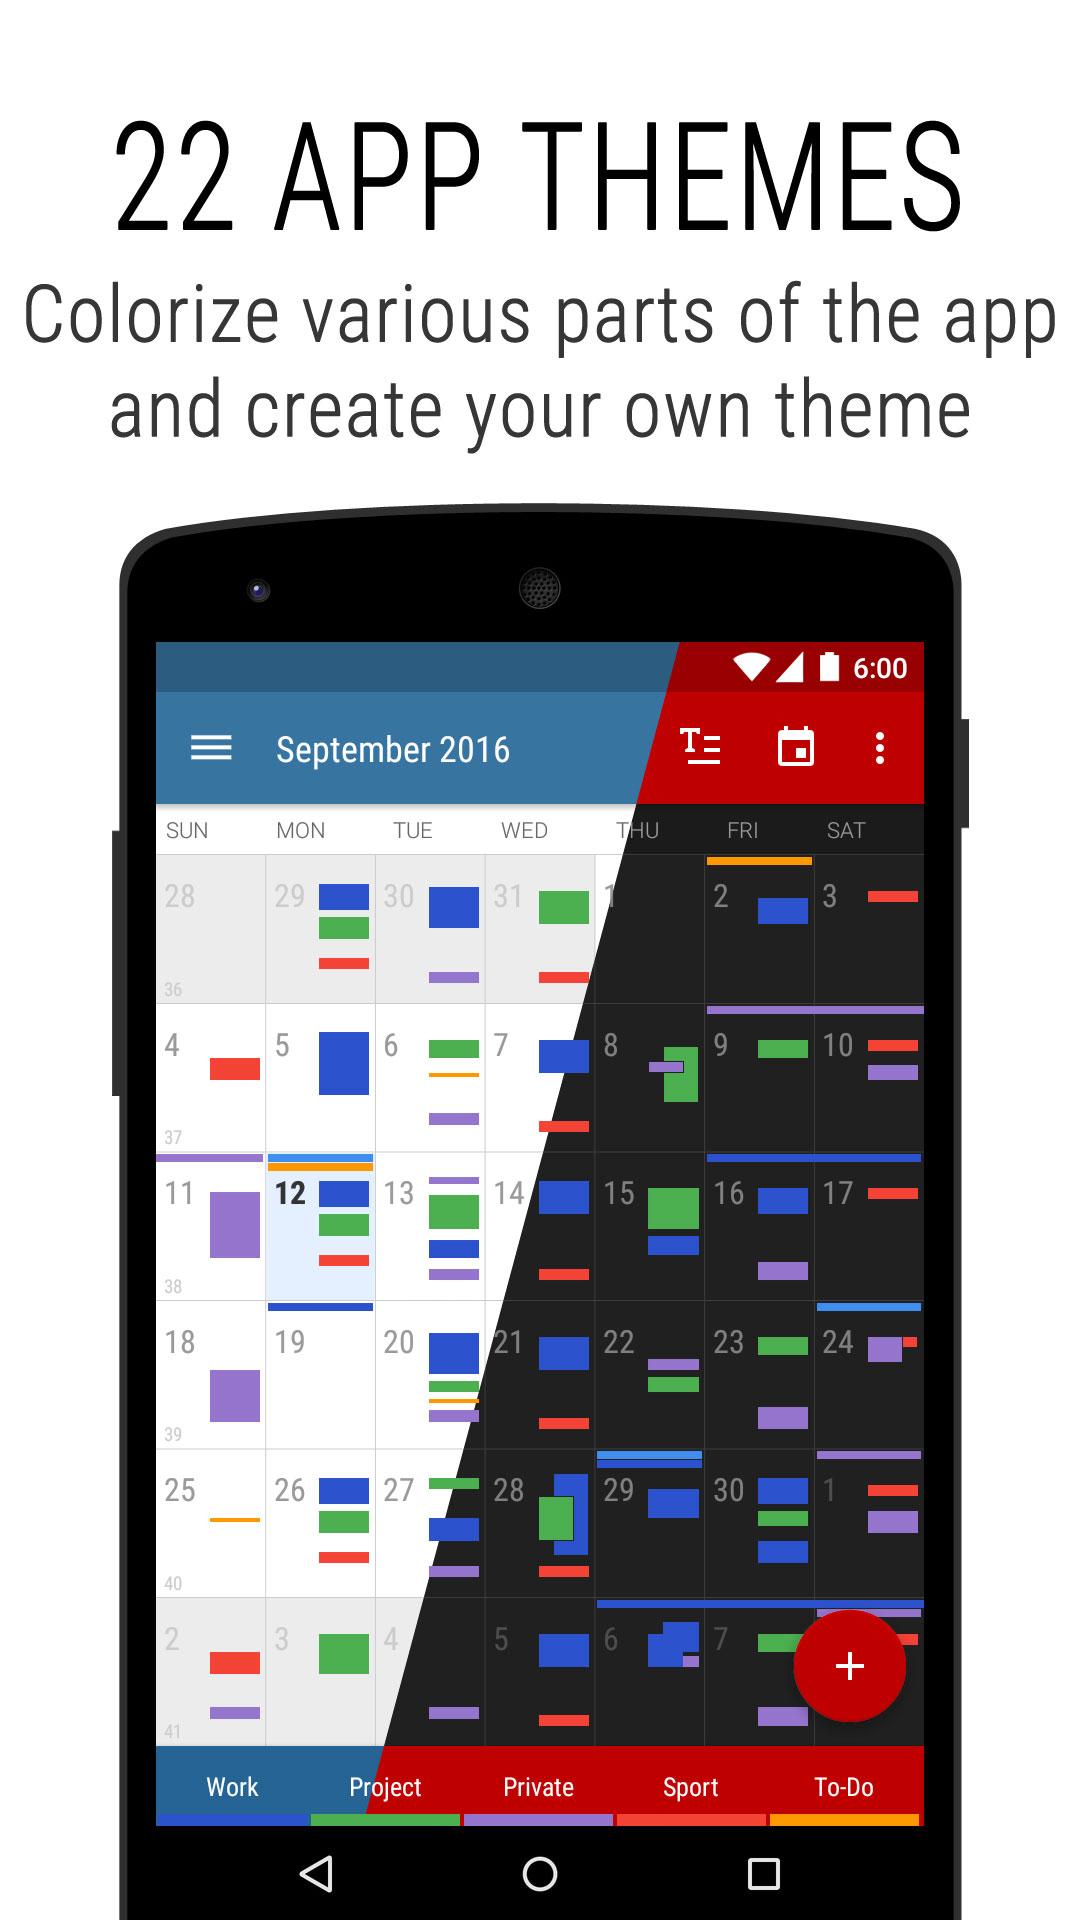 Business Calendar 2・Agenda, Planner & Organizer: Amazon.co ...